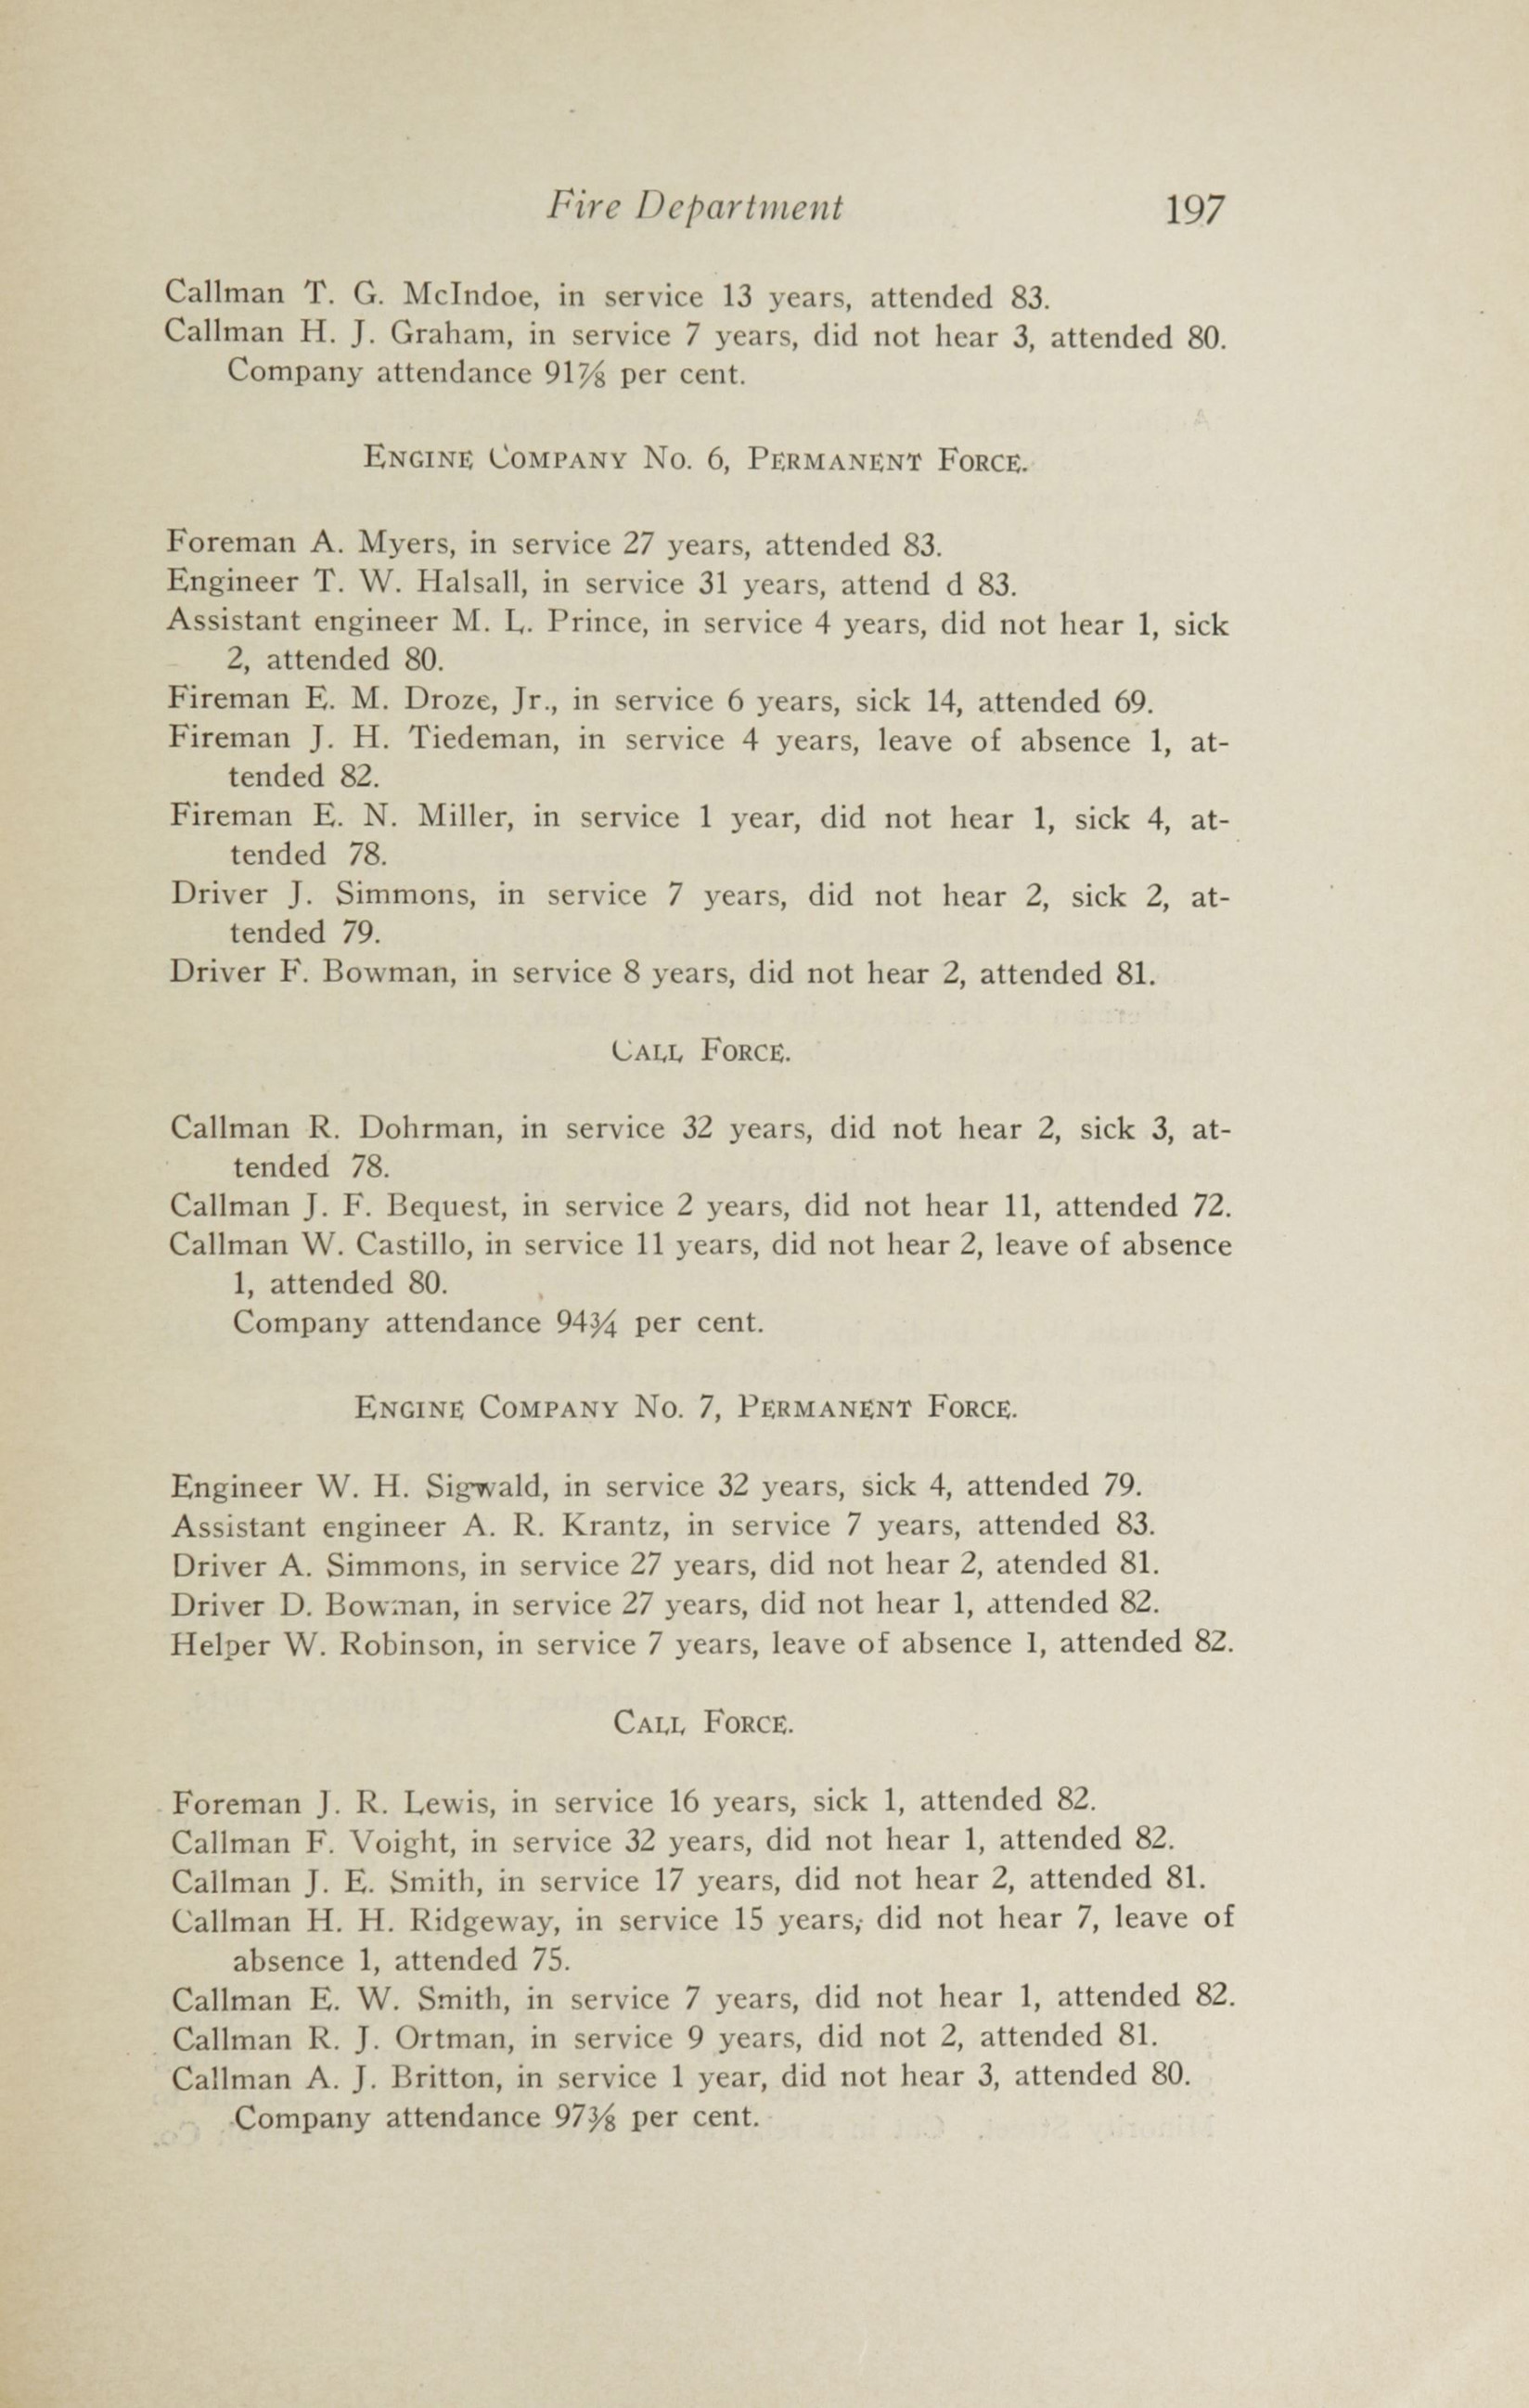 Charleston Yearbook, 1913, page 197